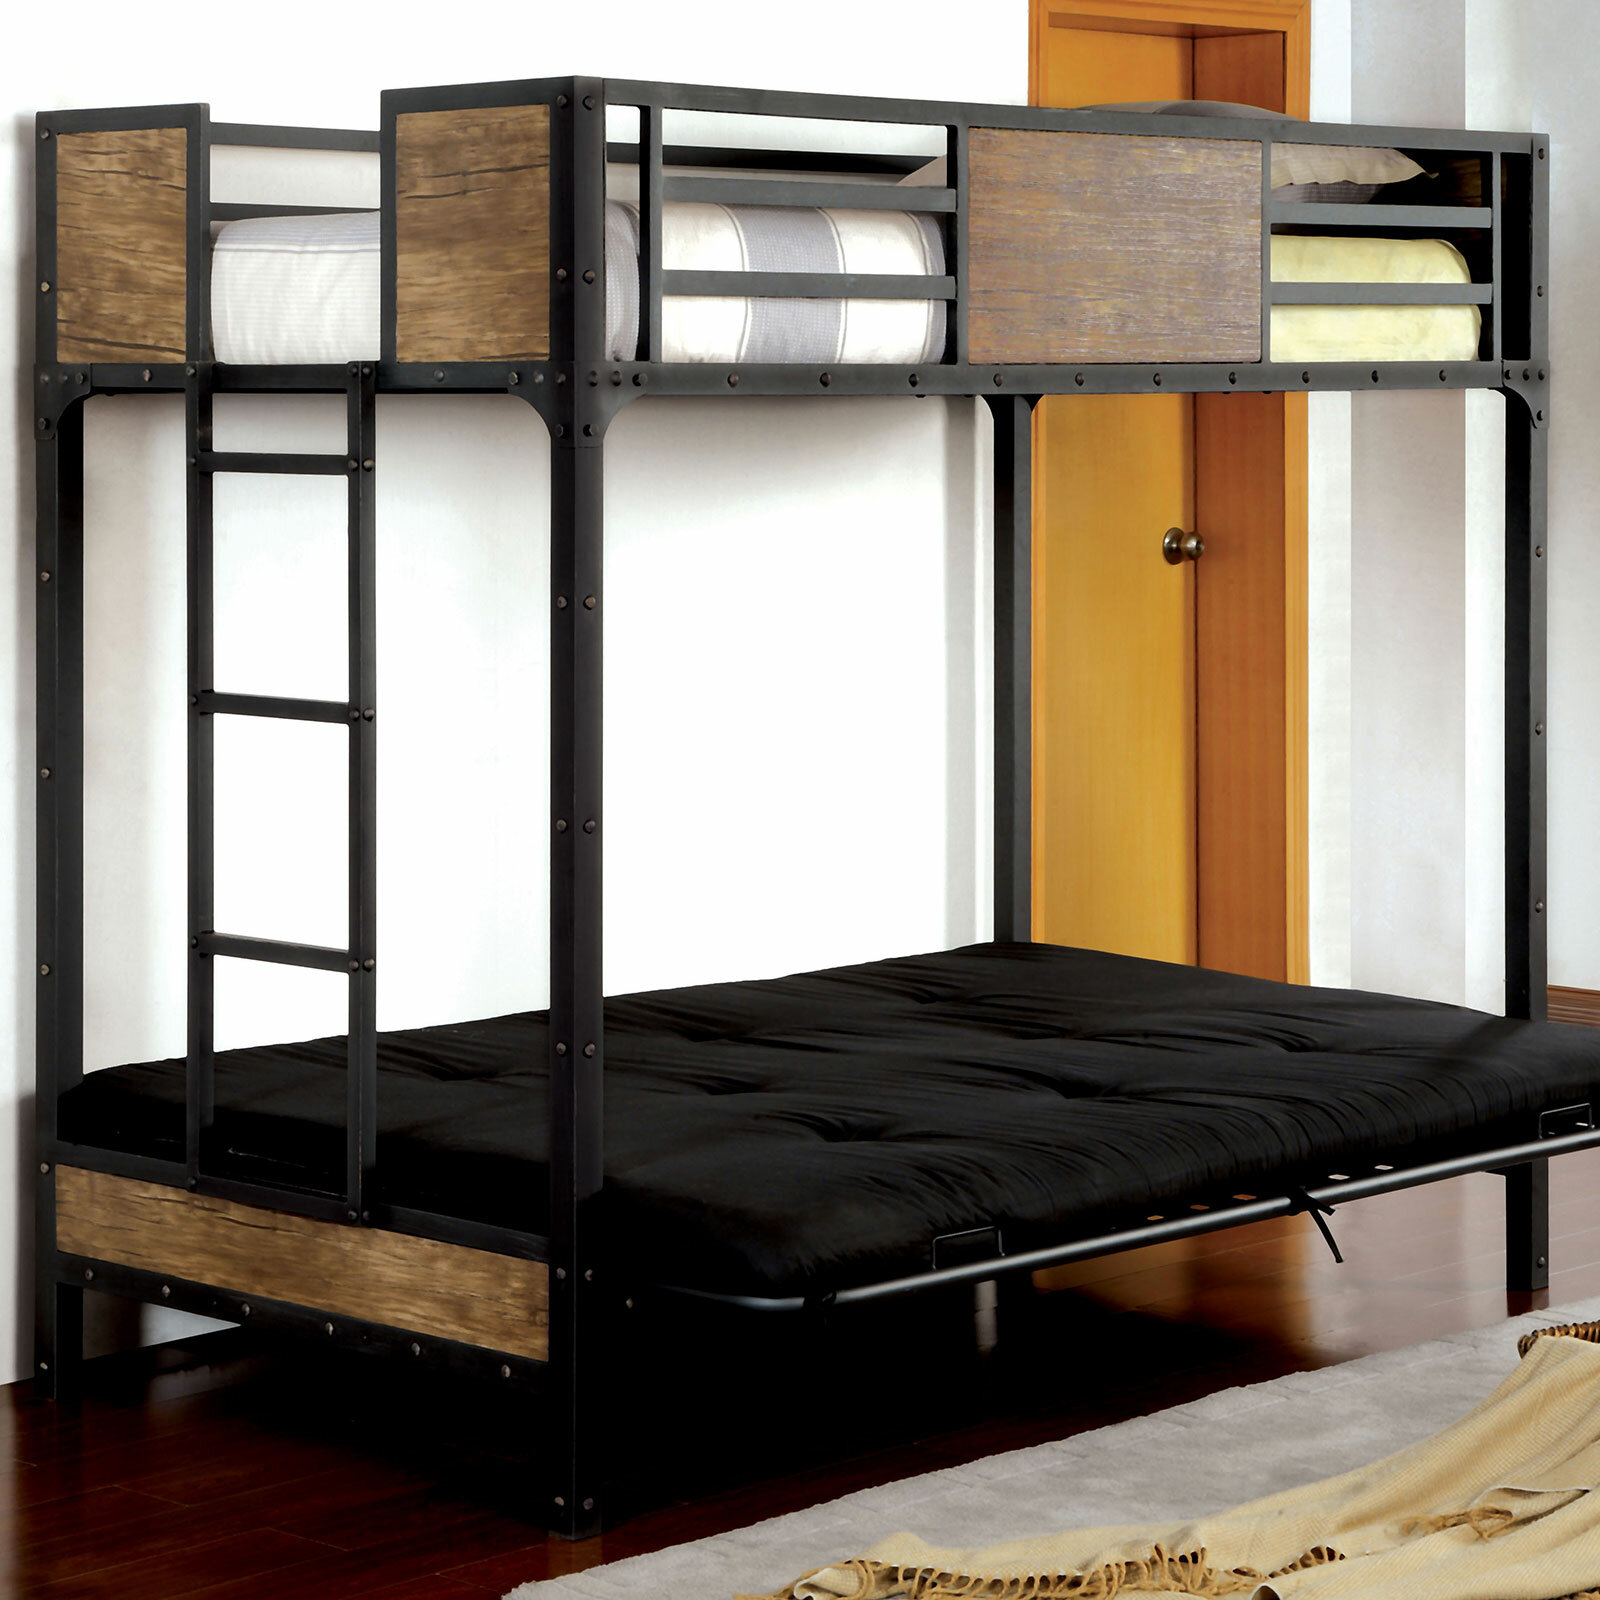 Espanola Twin Futon Bunk Bed